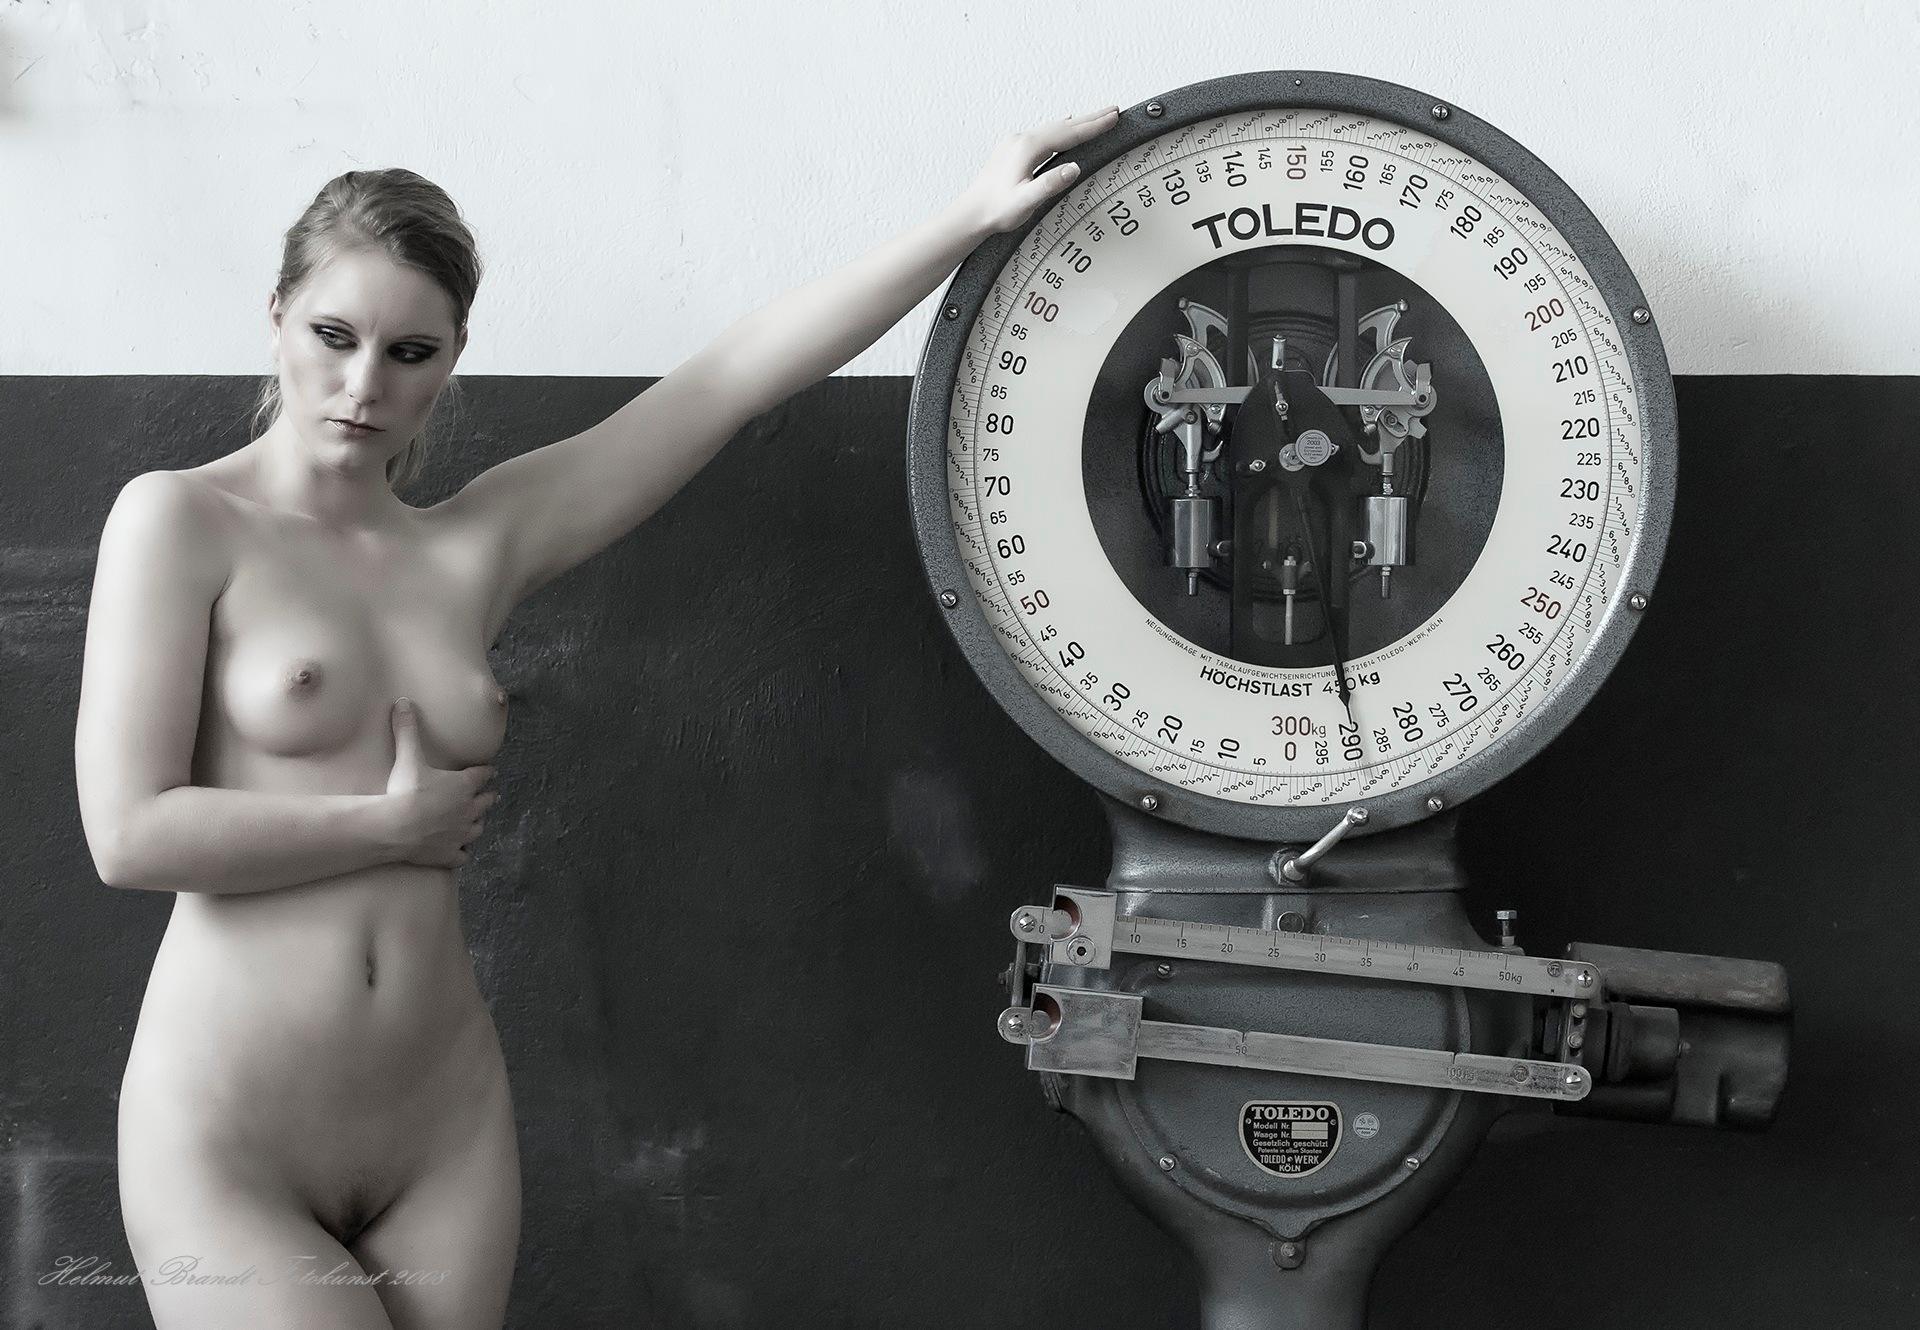 Claudia - Waage - Scales by Helmut Brandt